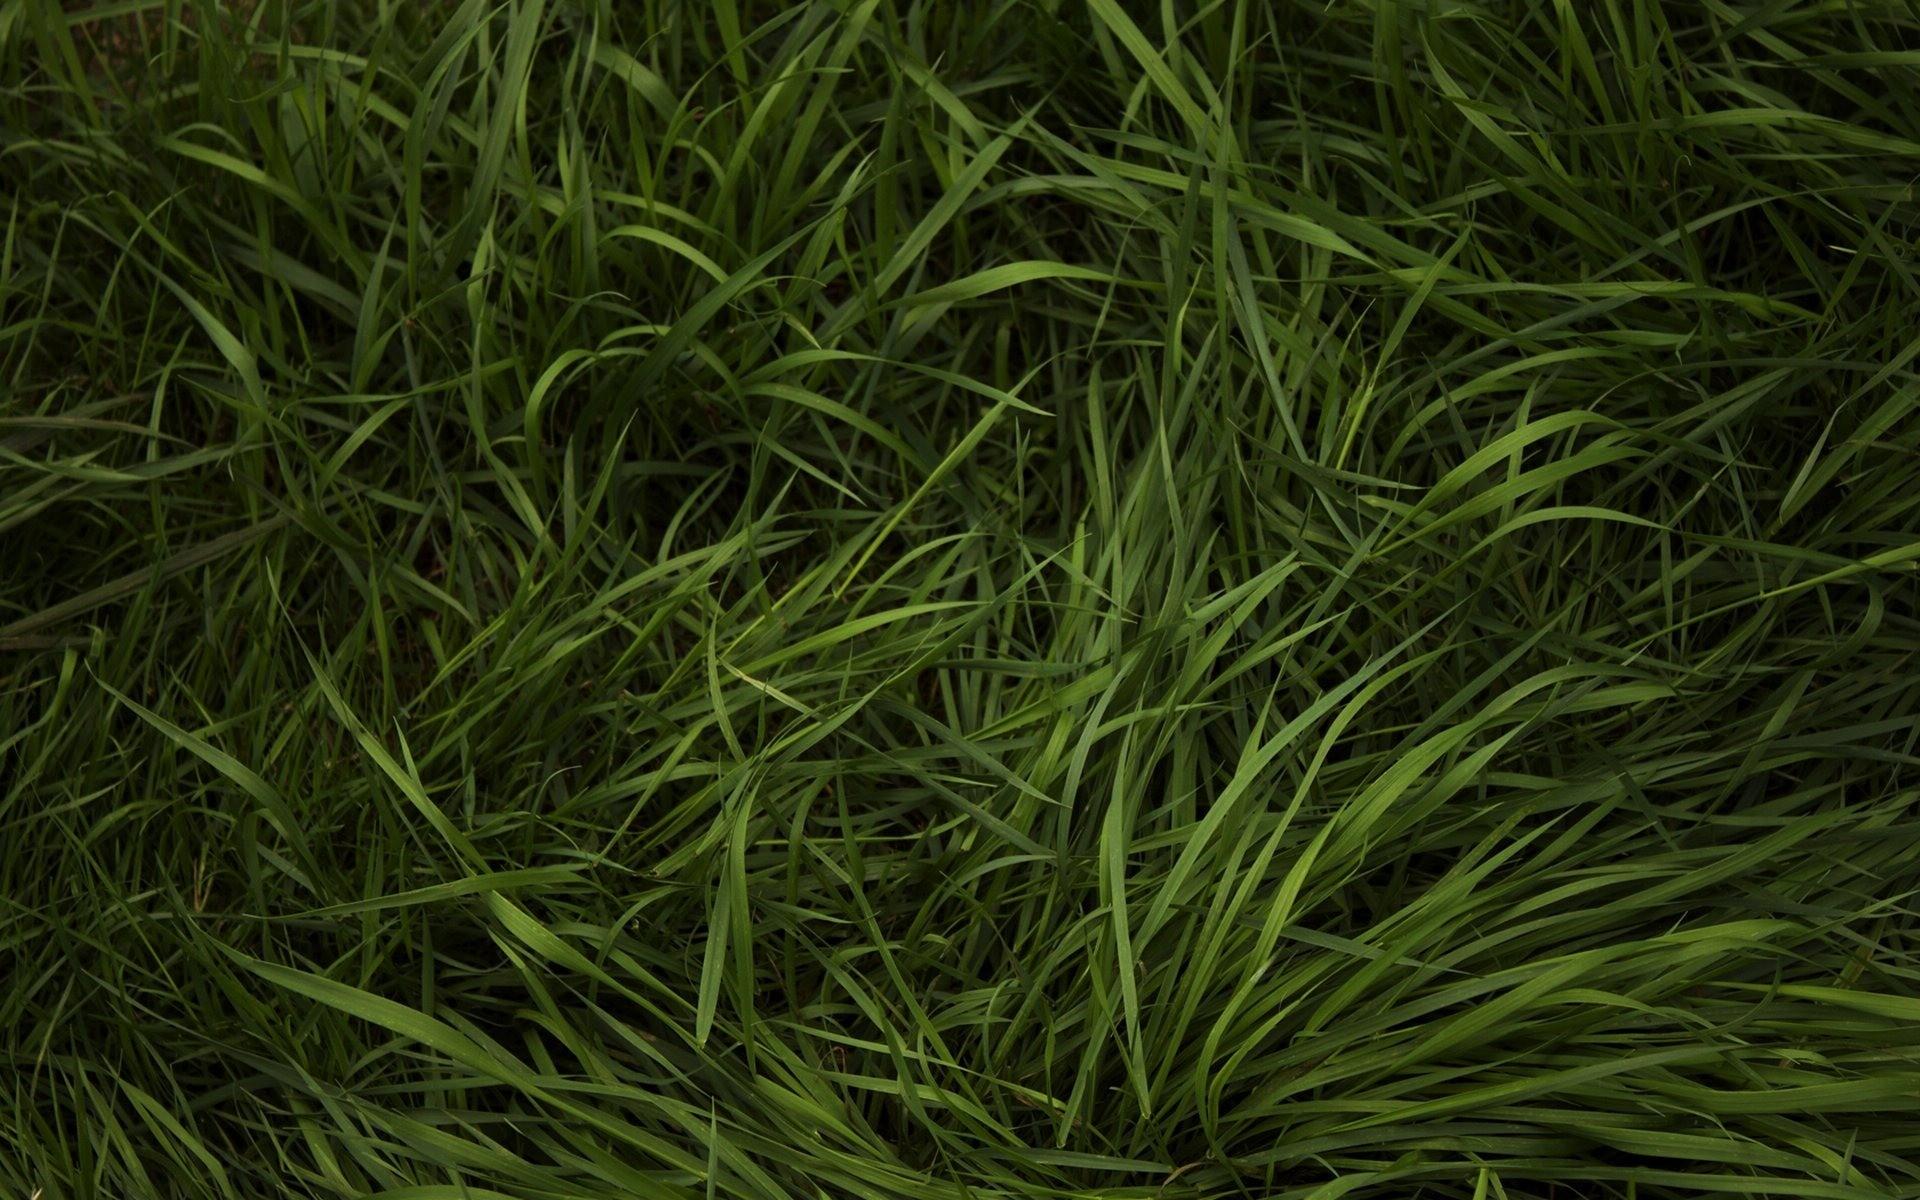 Textura de pasto verde - 1920x1200